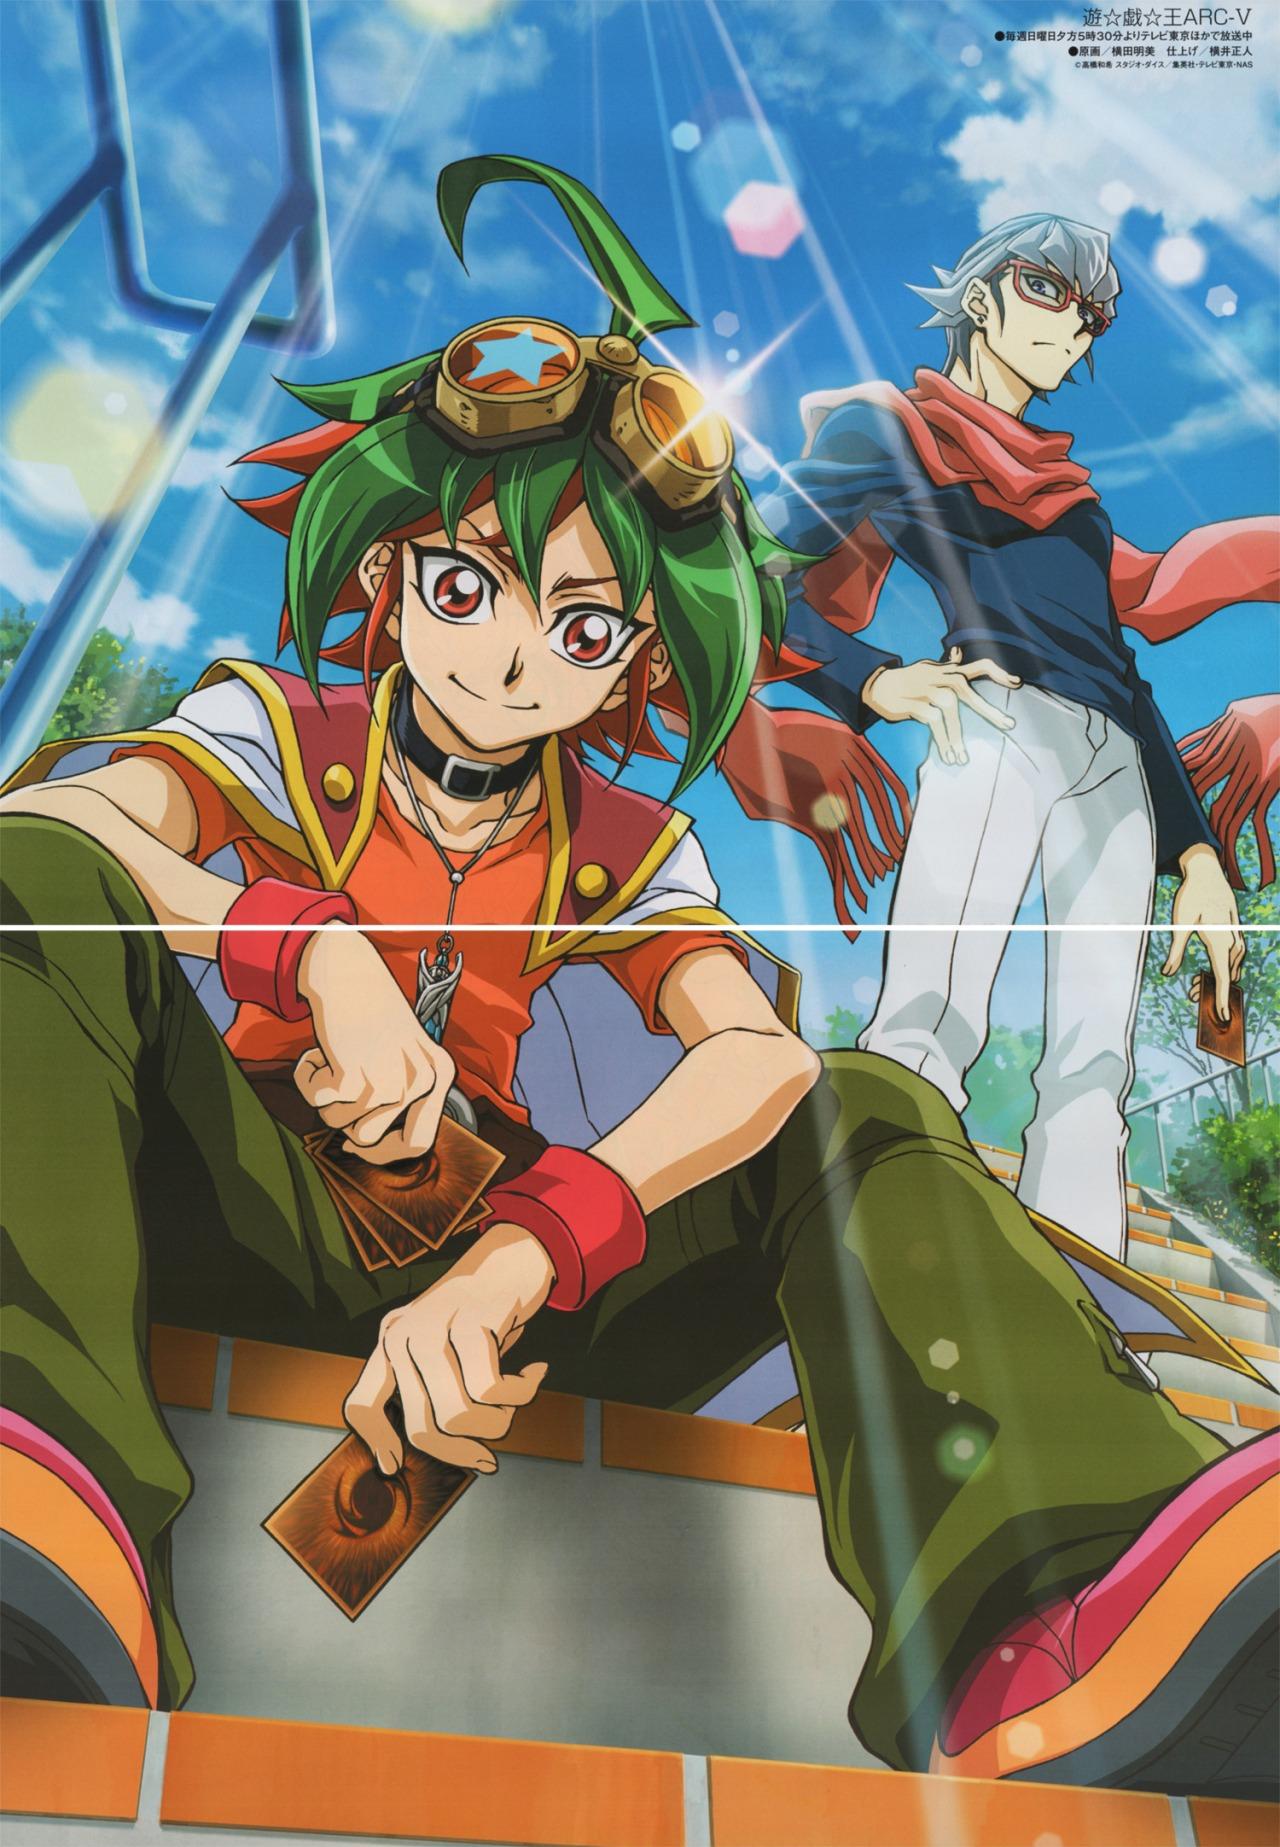 Pin by Kaibutsu on Yu-Gi-Oh! Arc-V | Yu gi yo, Anime